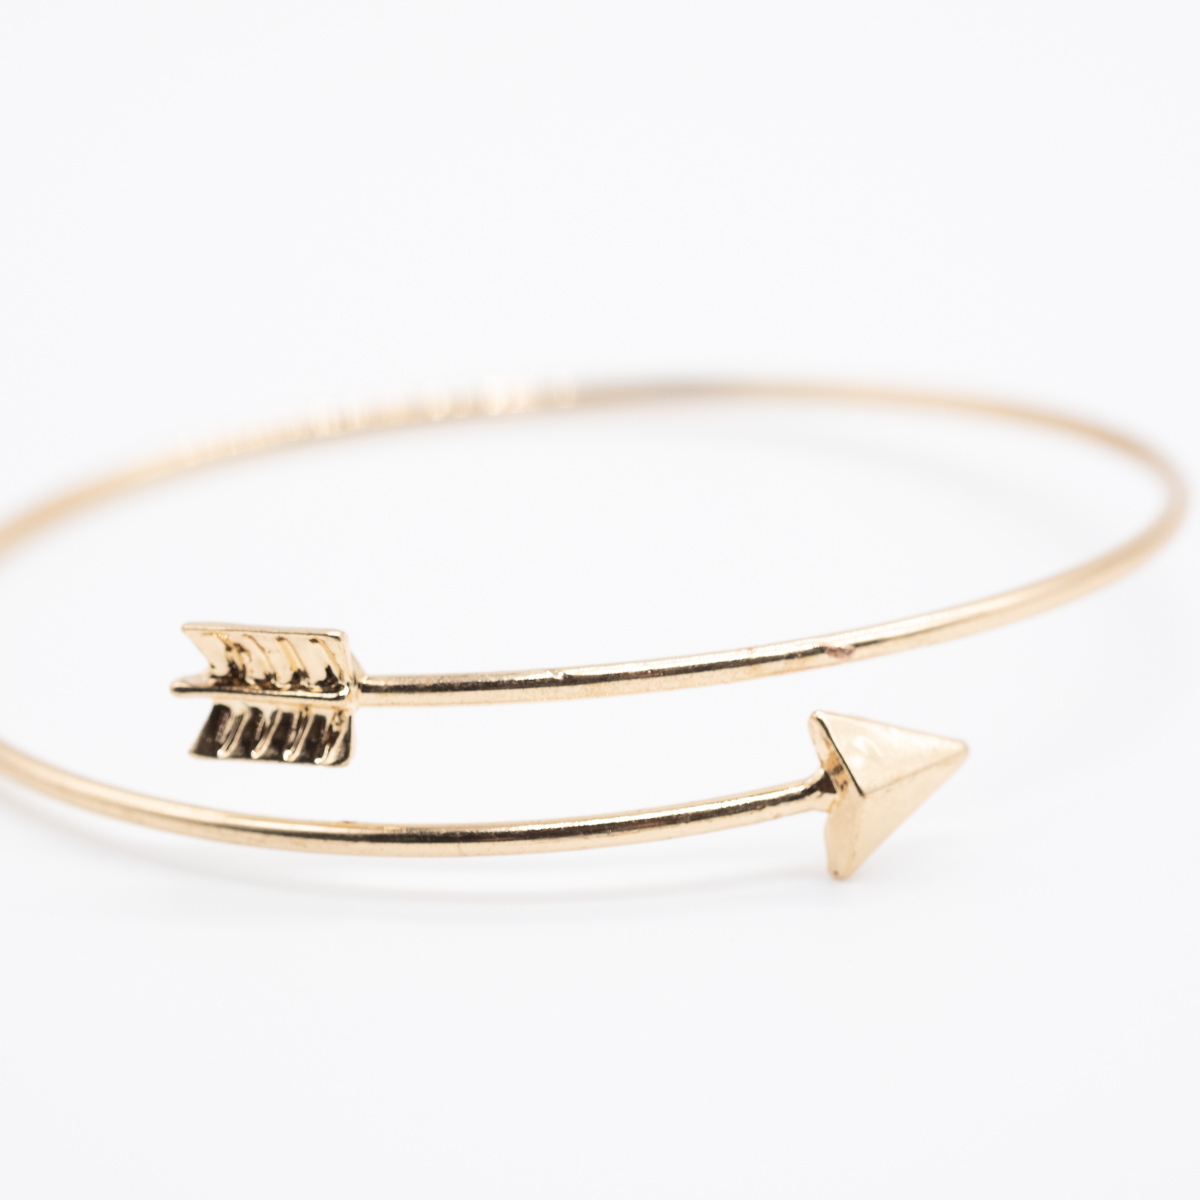 BCT-014 boho bohemian armband pijl goud metaal